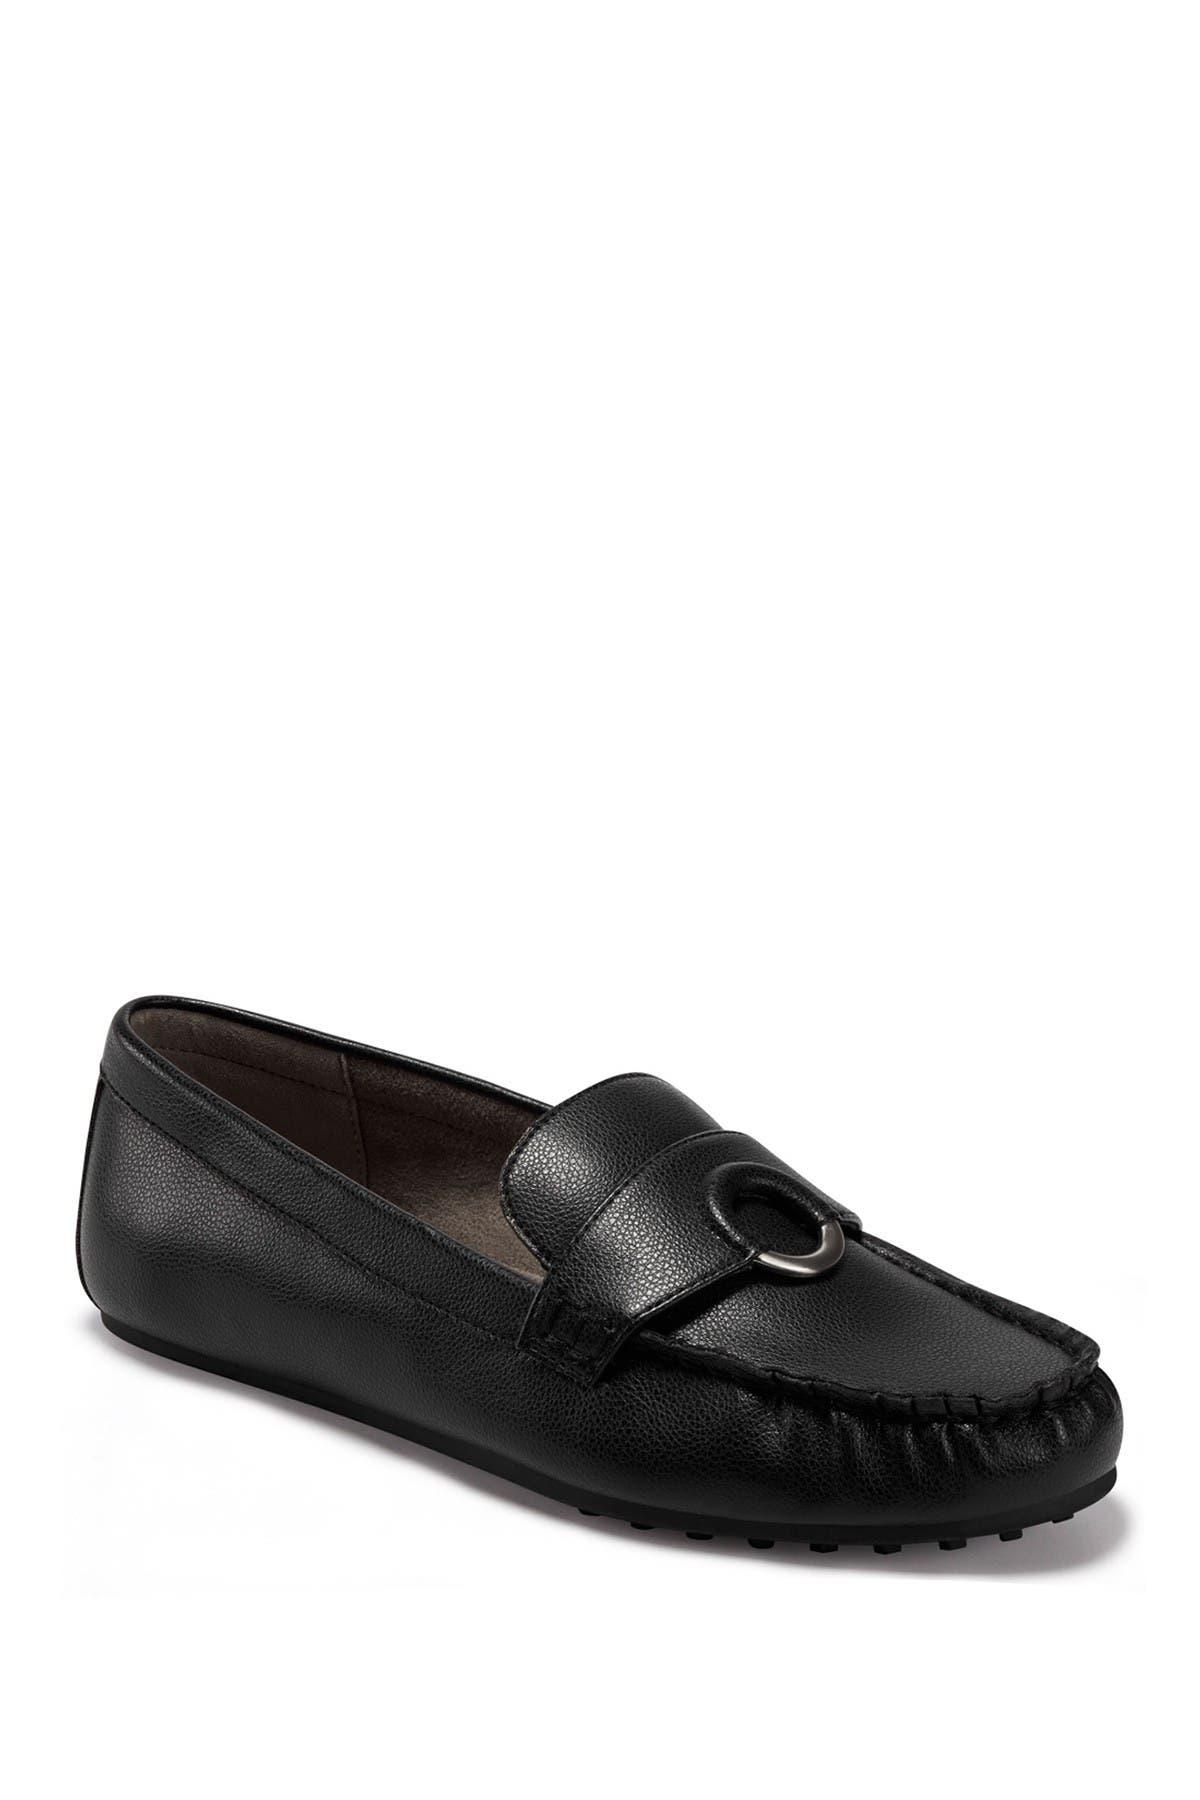 Aerosoles Loafers DANI RING MOCCASIN